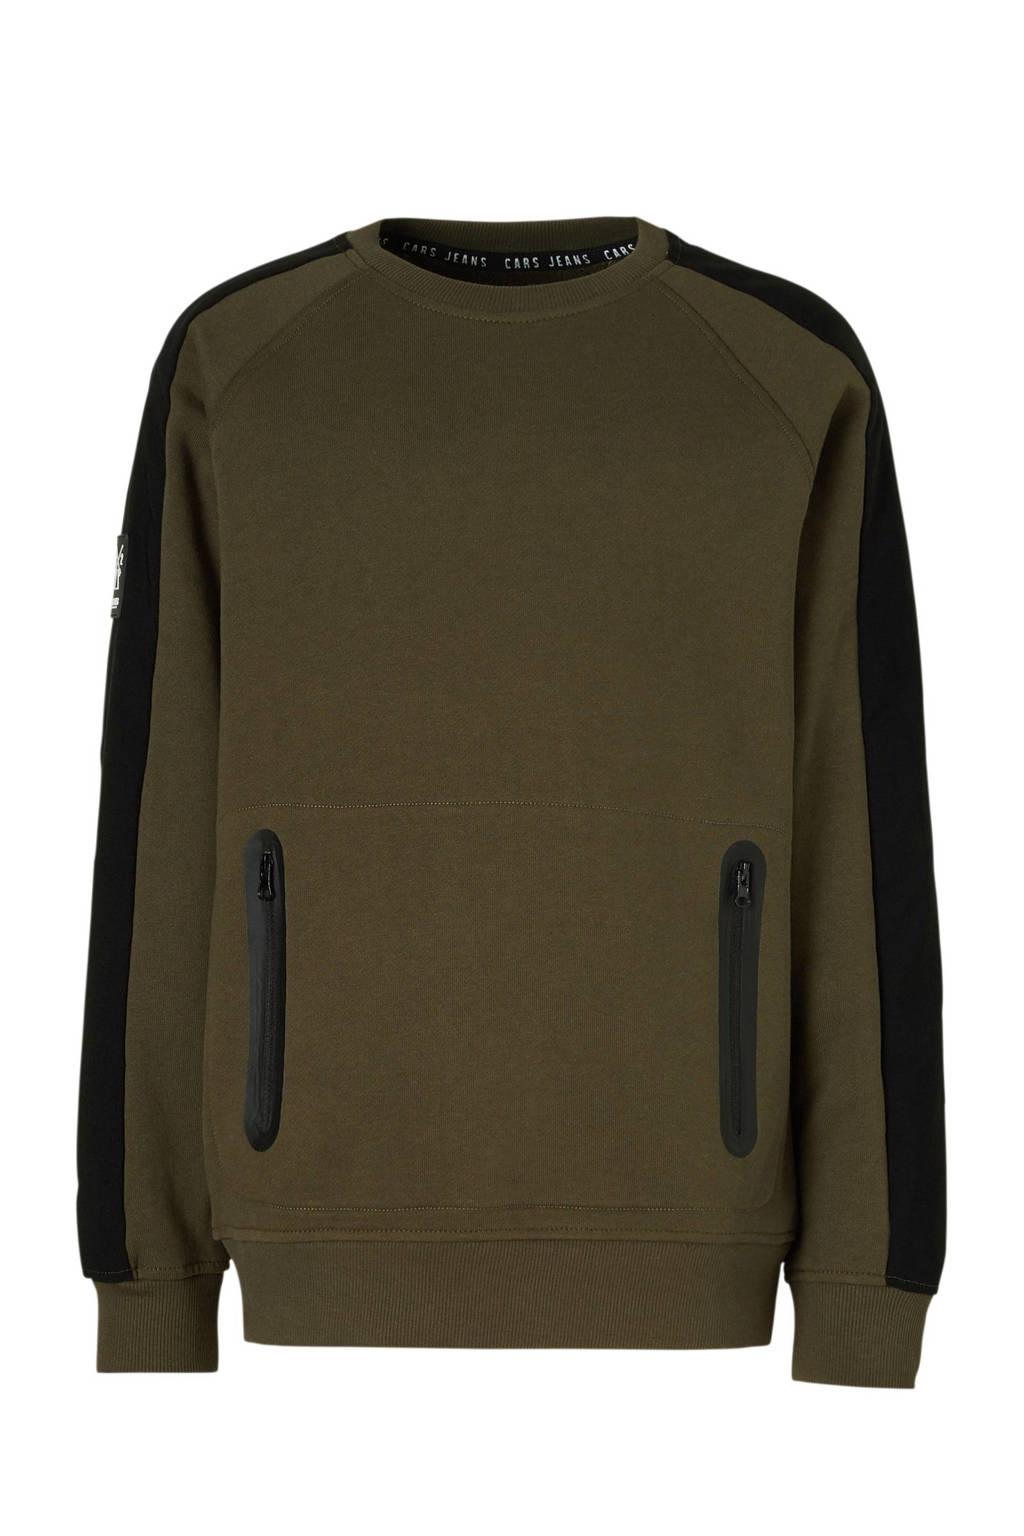 Cars sweater McKenzie met zijstreep kaki, Kaki/zwart